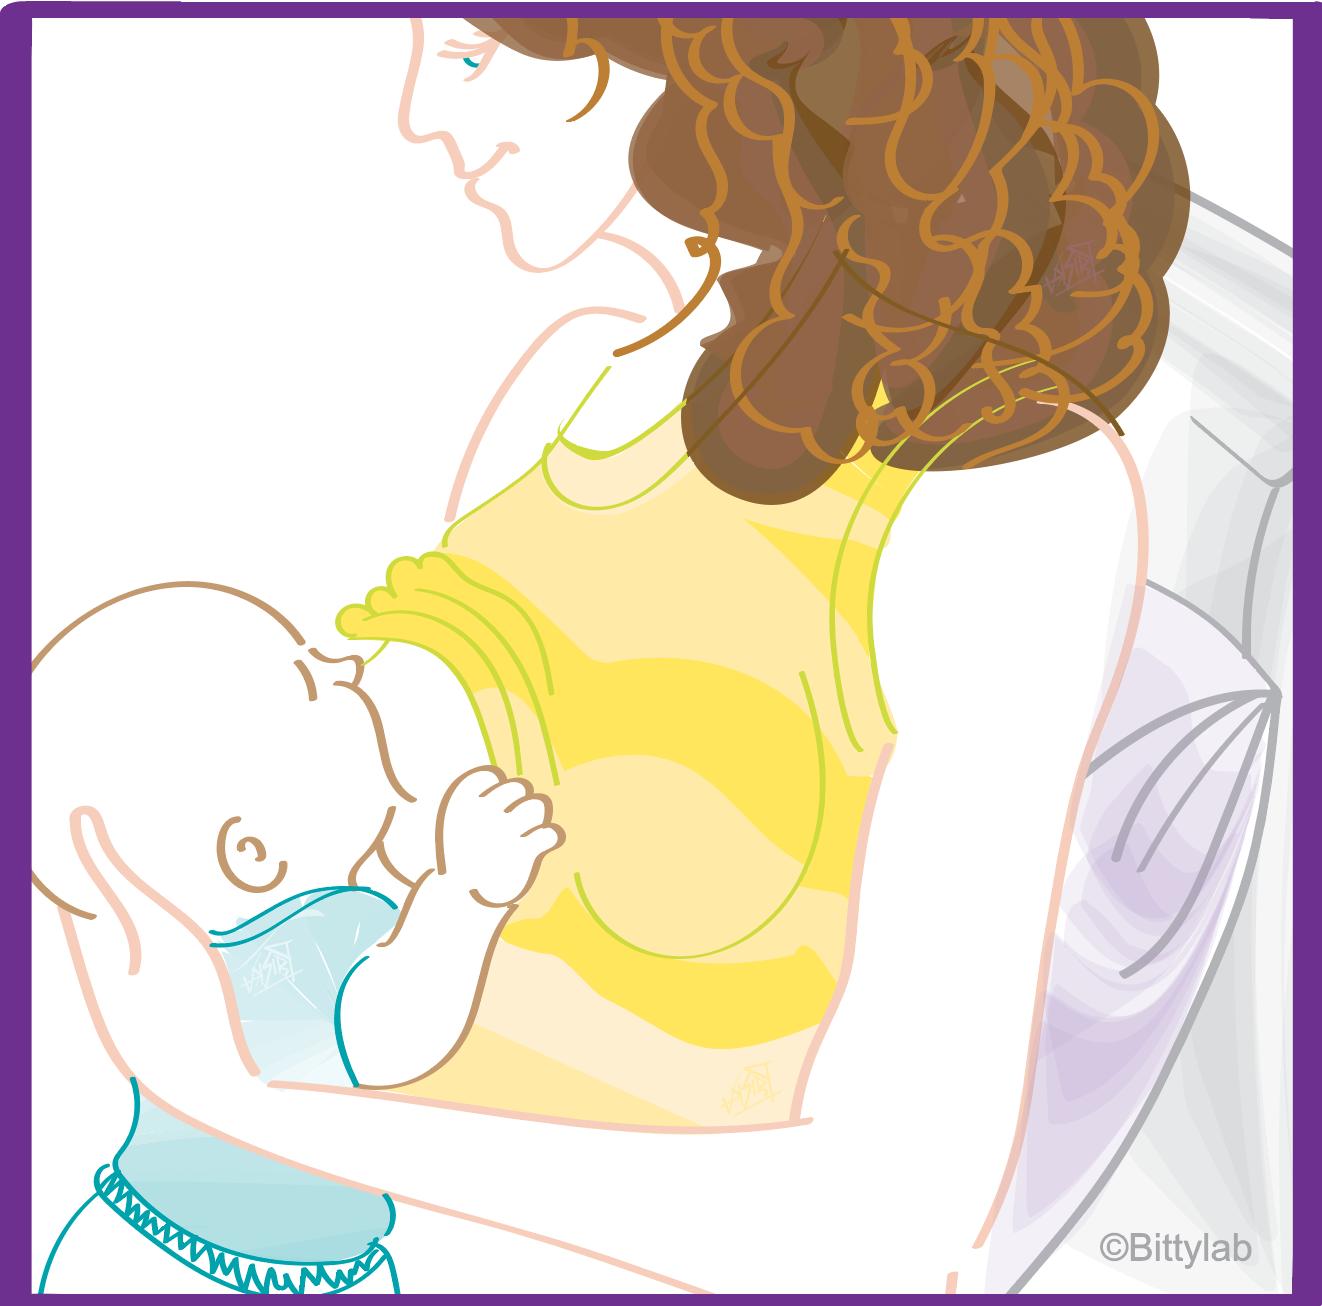 End GERD when breastfeeding